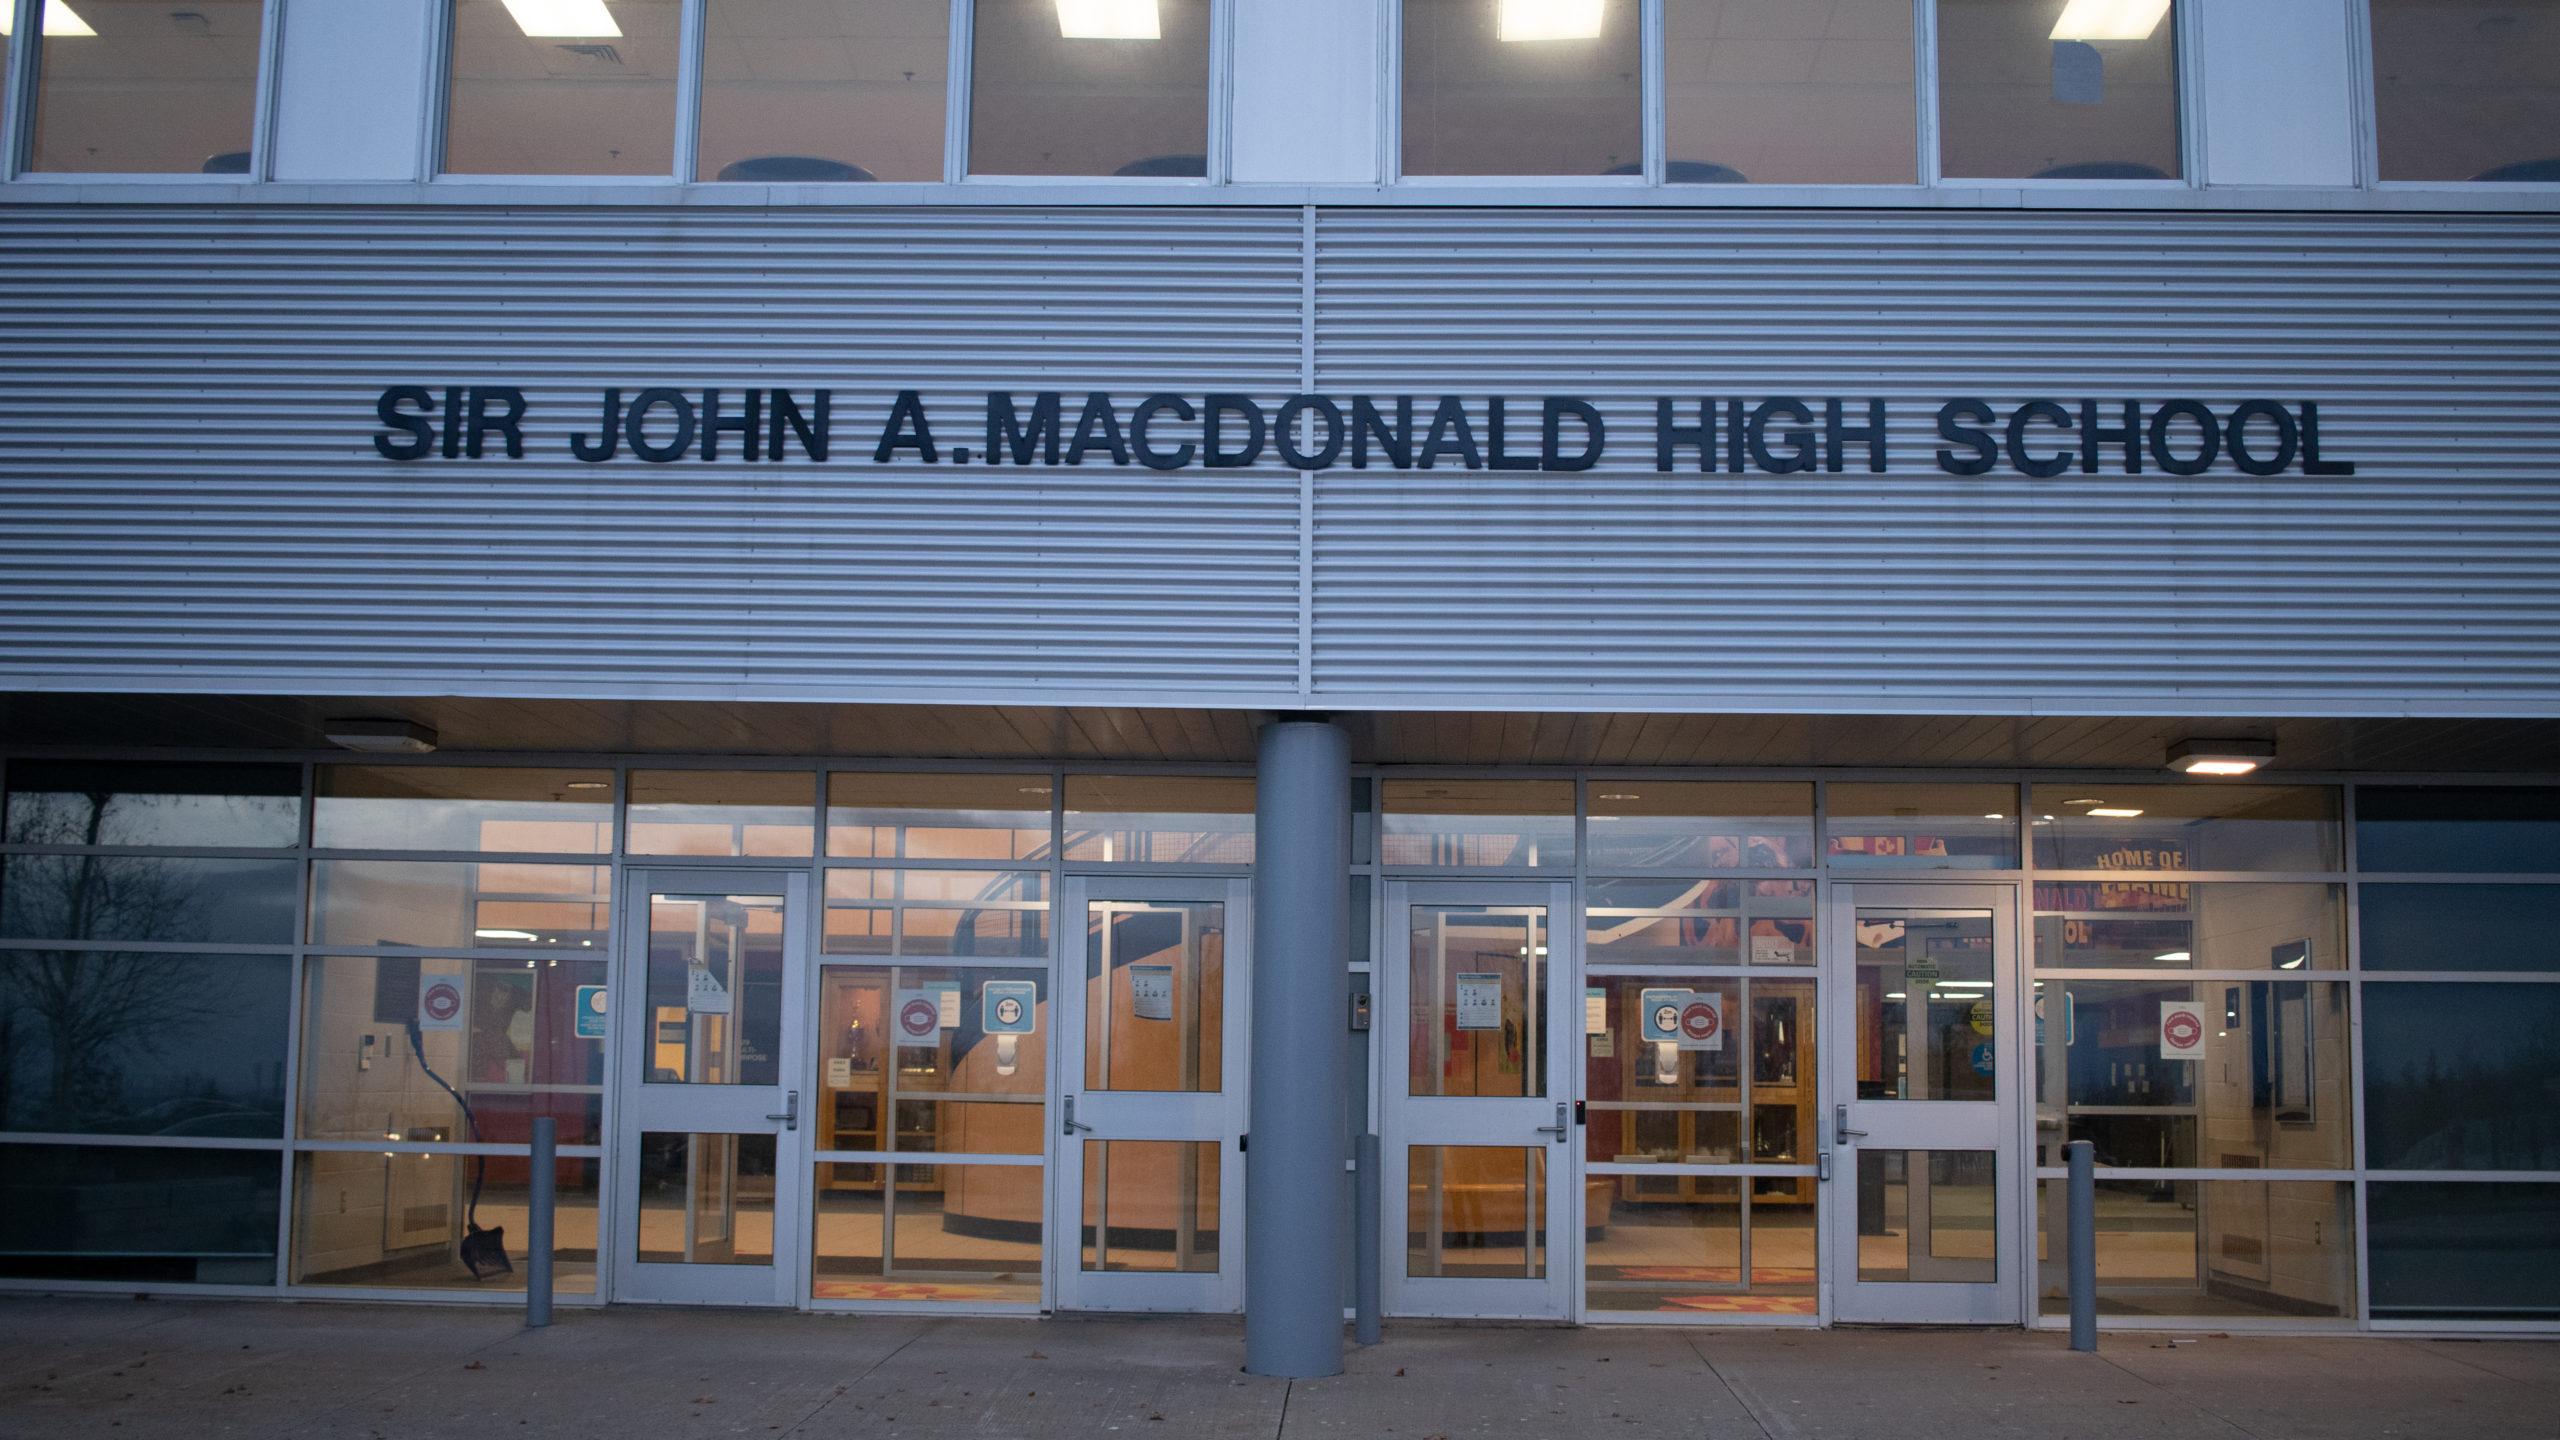 Sir John A. Macdonald High School's main doors.